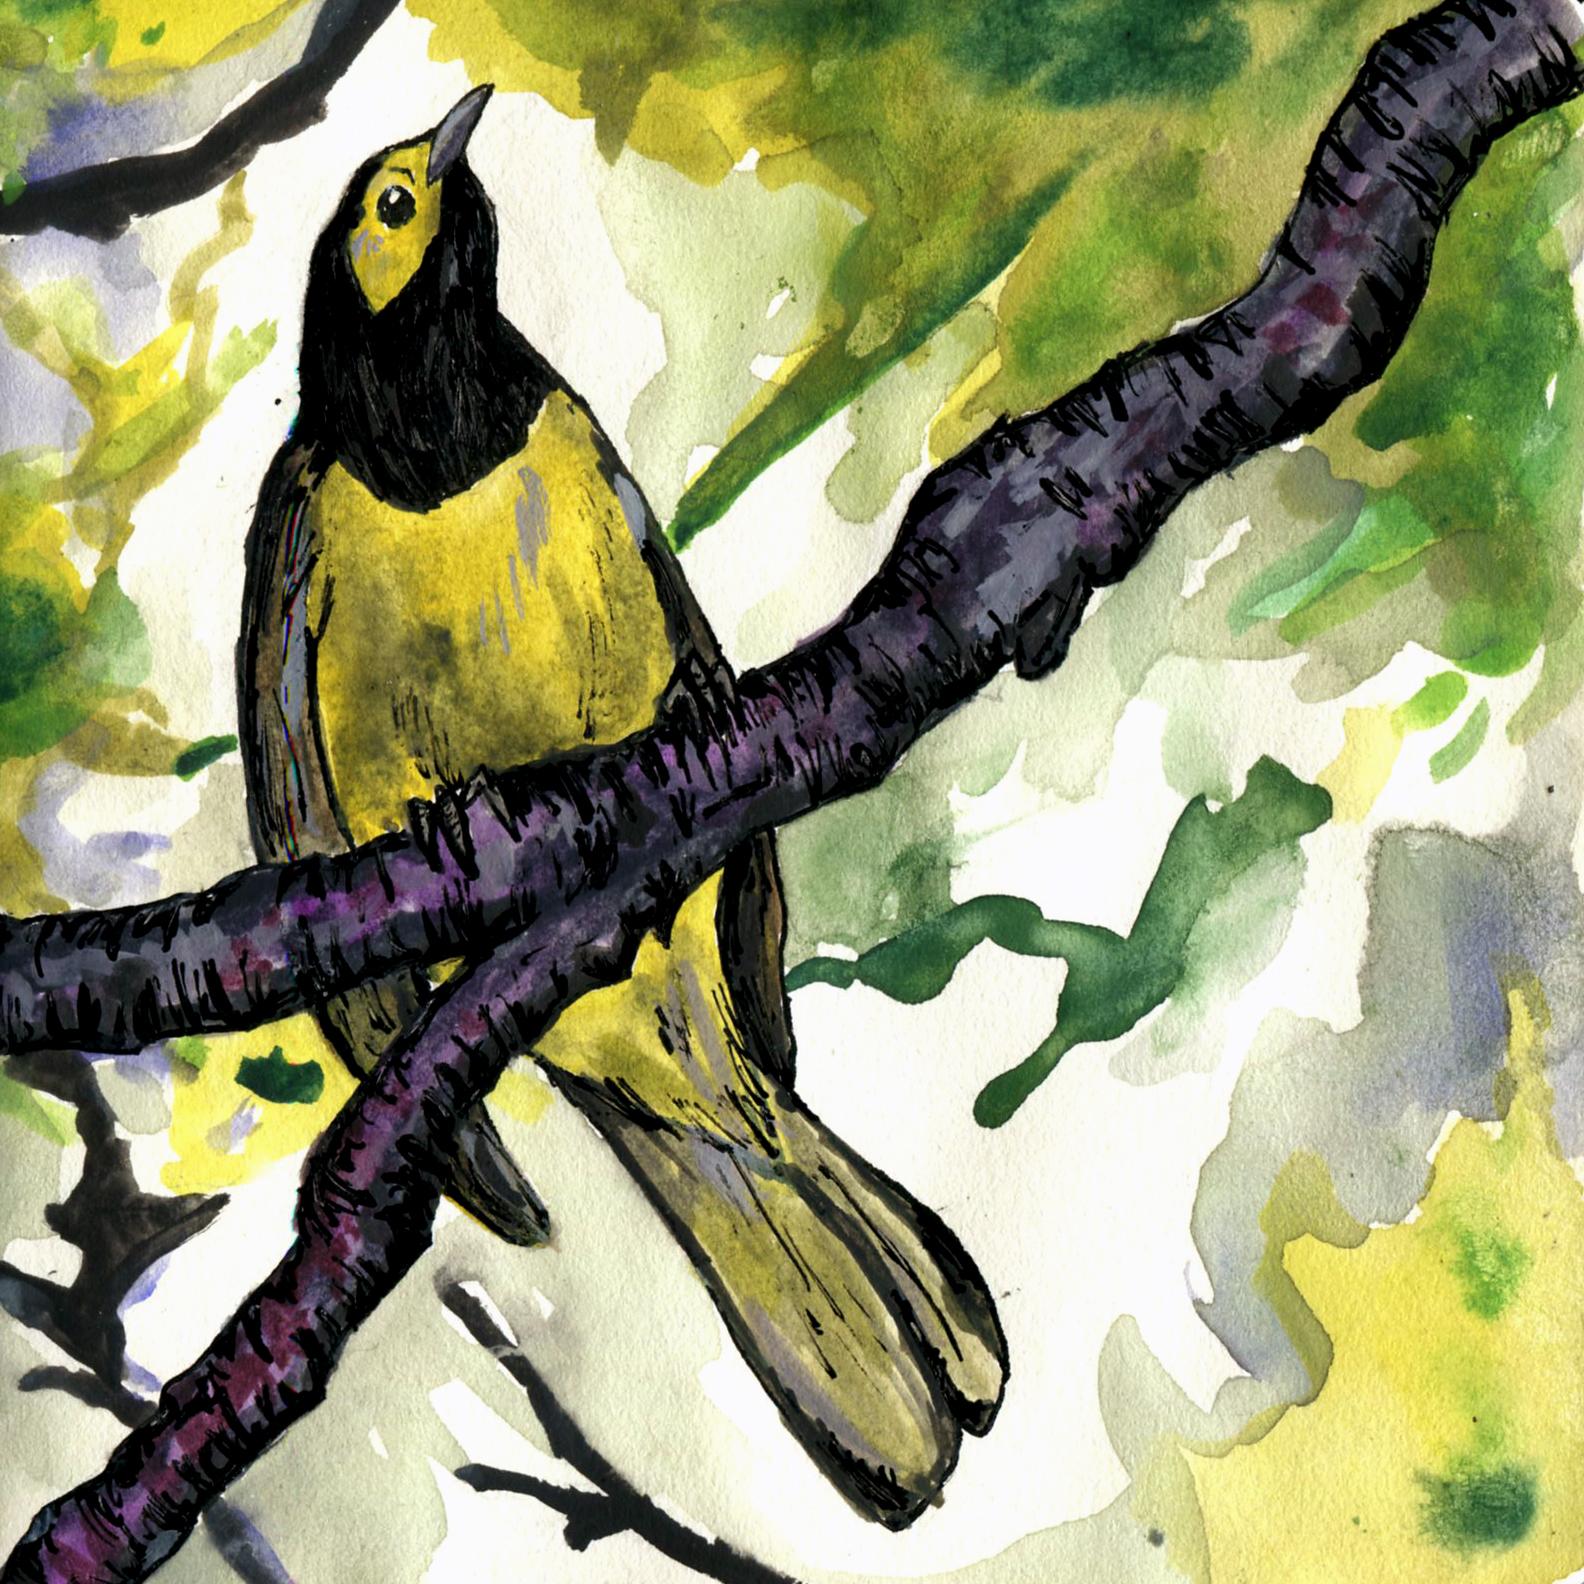 312. Hooded Warbler